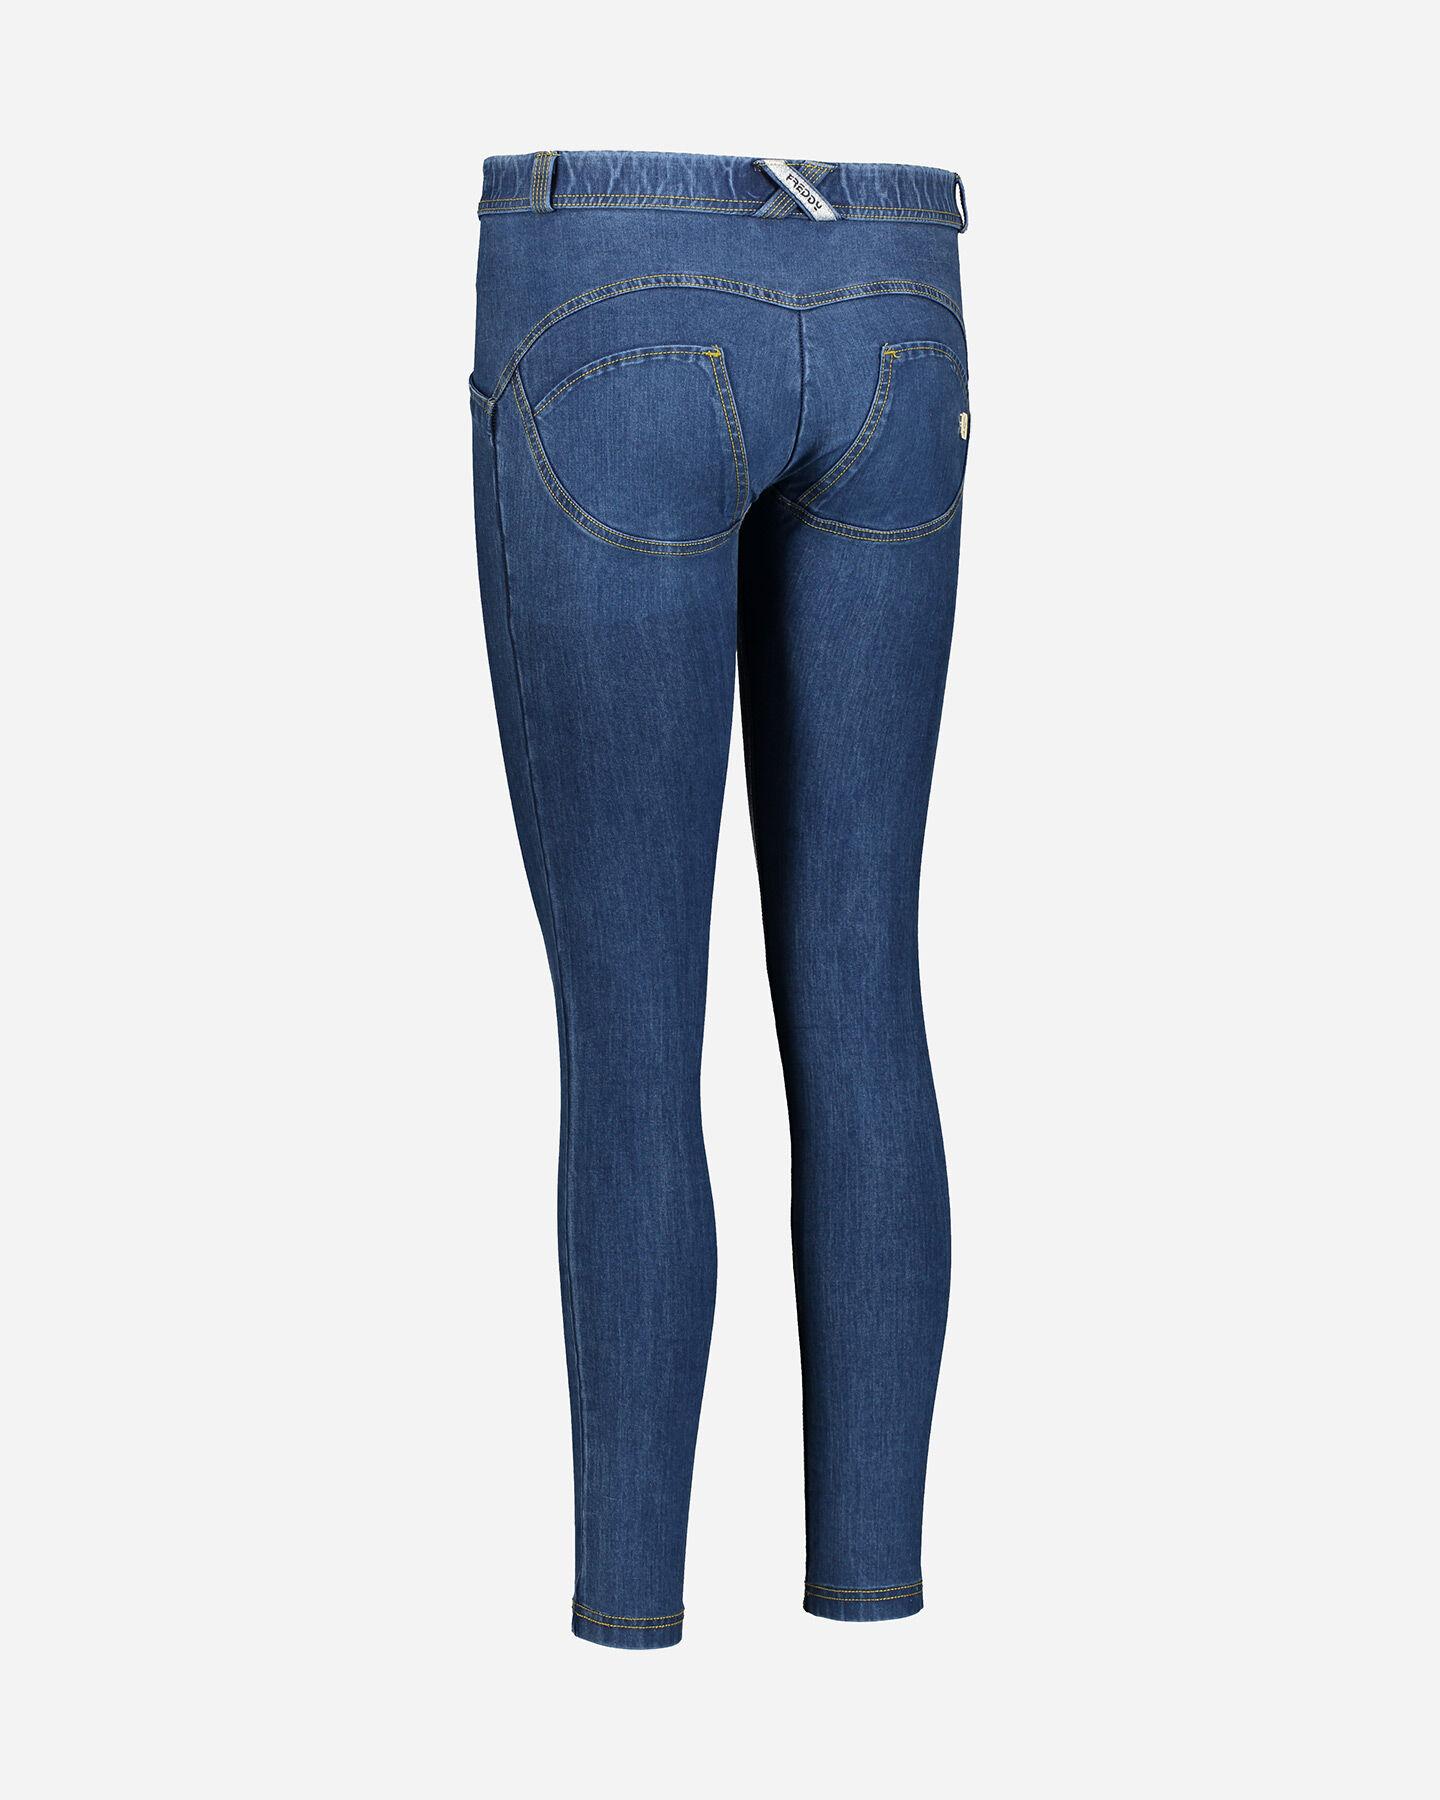 Pantalone FREDDY HIGH WAIST NOW WRUP W S5222777 scatto 2